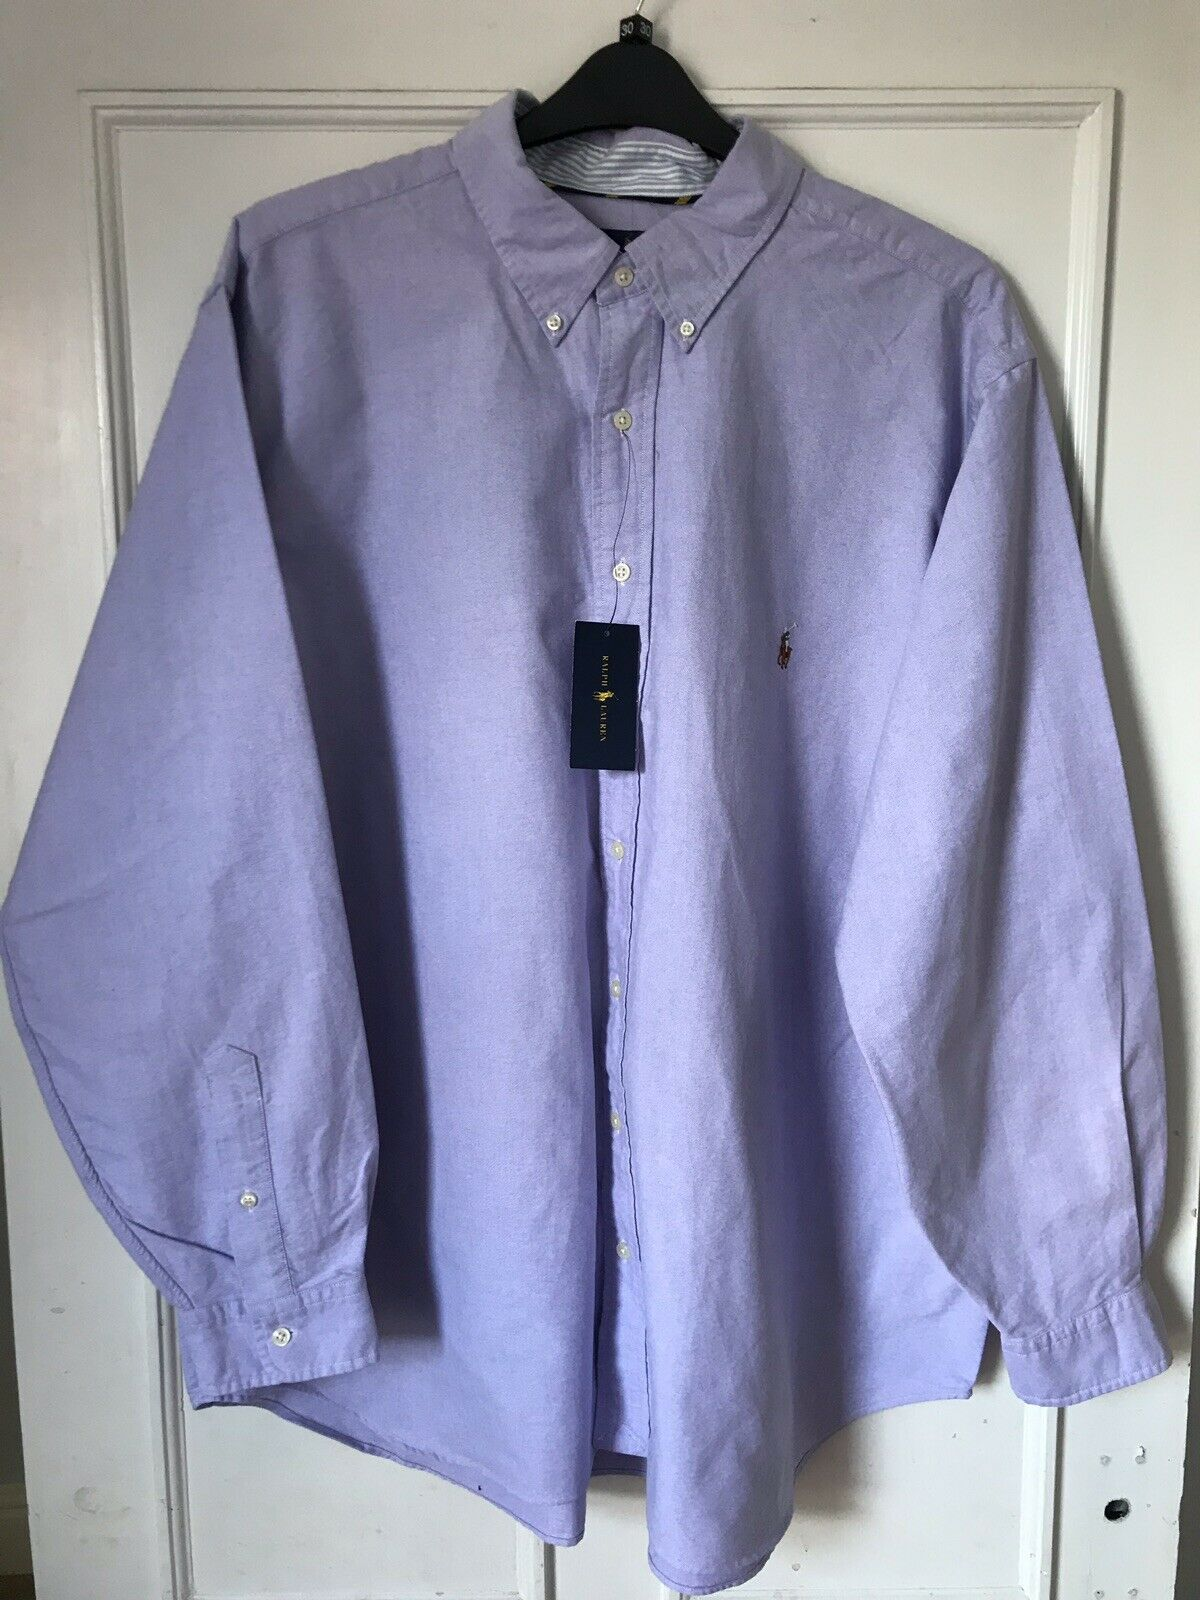 Mens Authentic Polo Ralph Lauren purplec Long Sleeve Shirt, Size 2XL Big, New